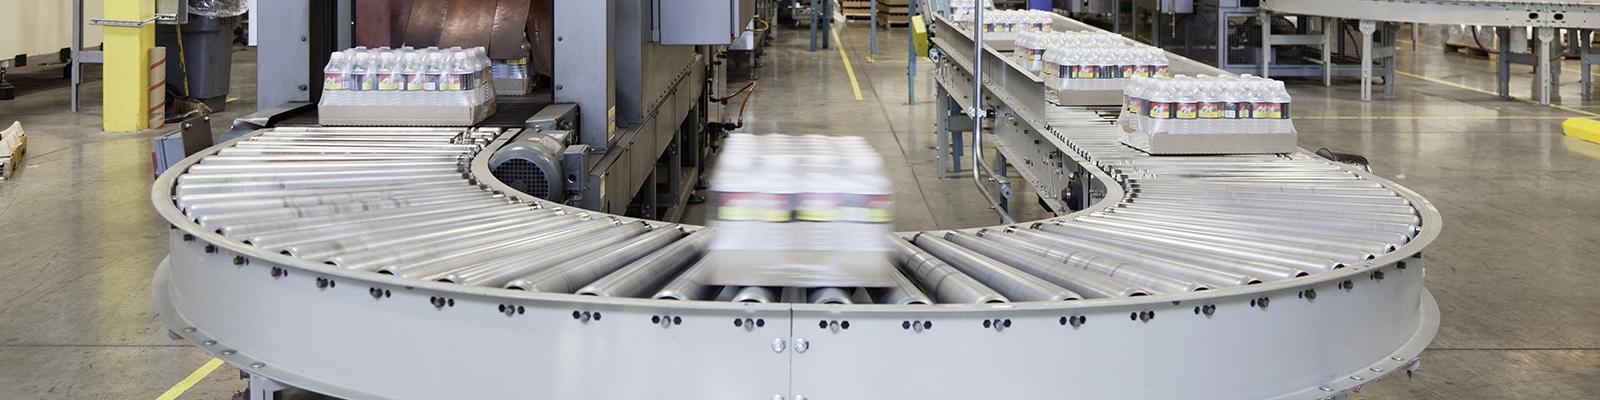 Products on conveyor belt